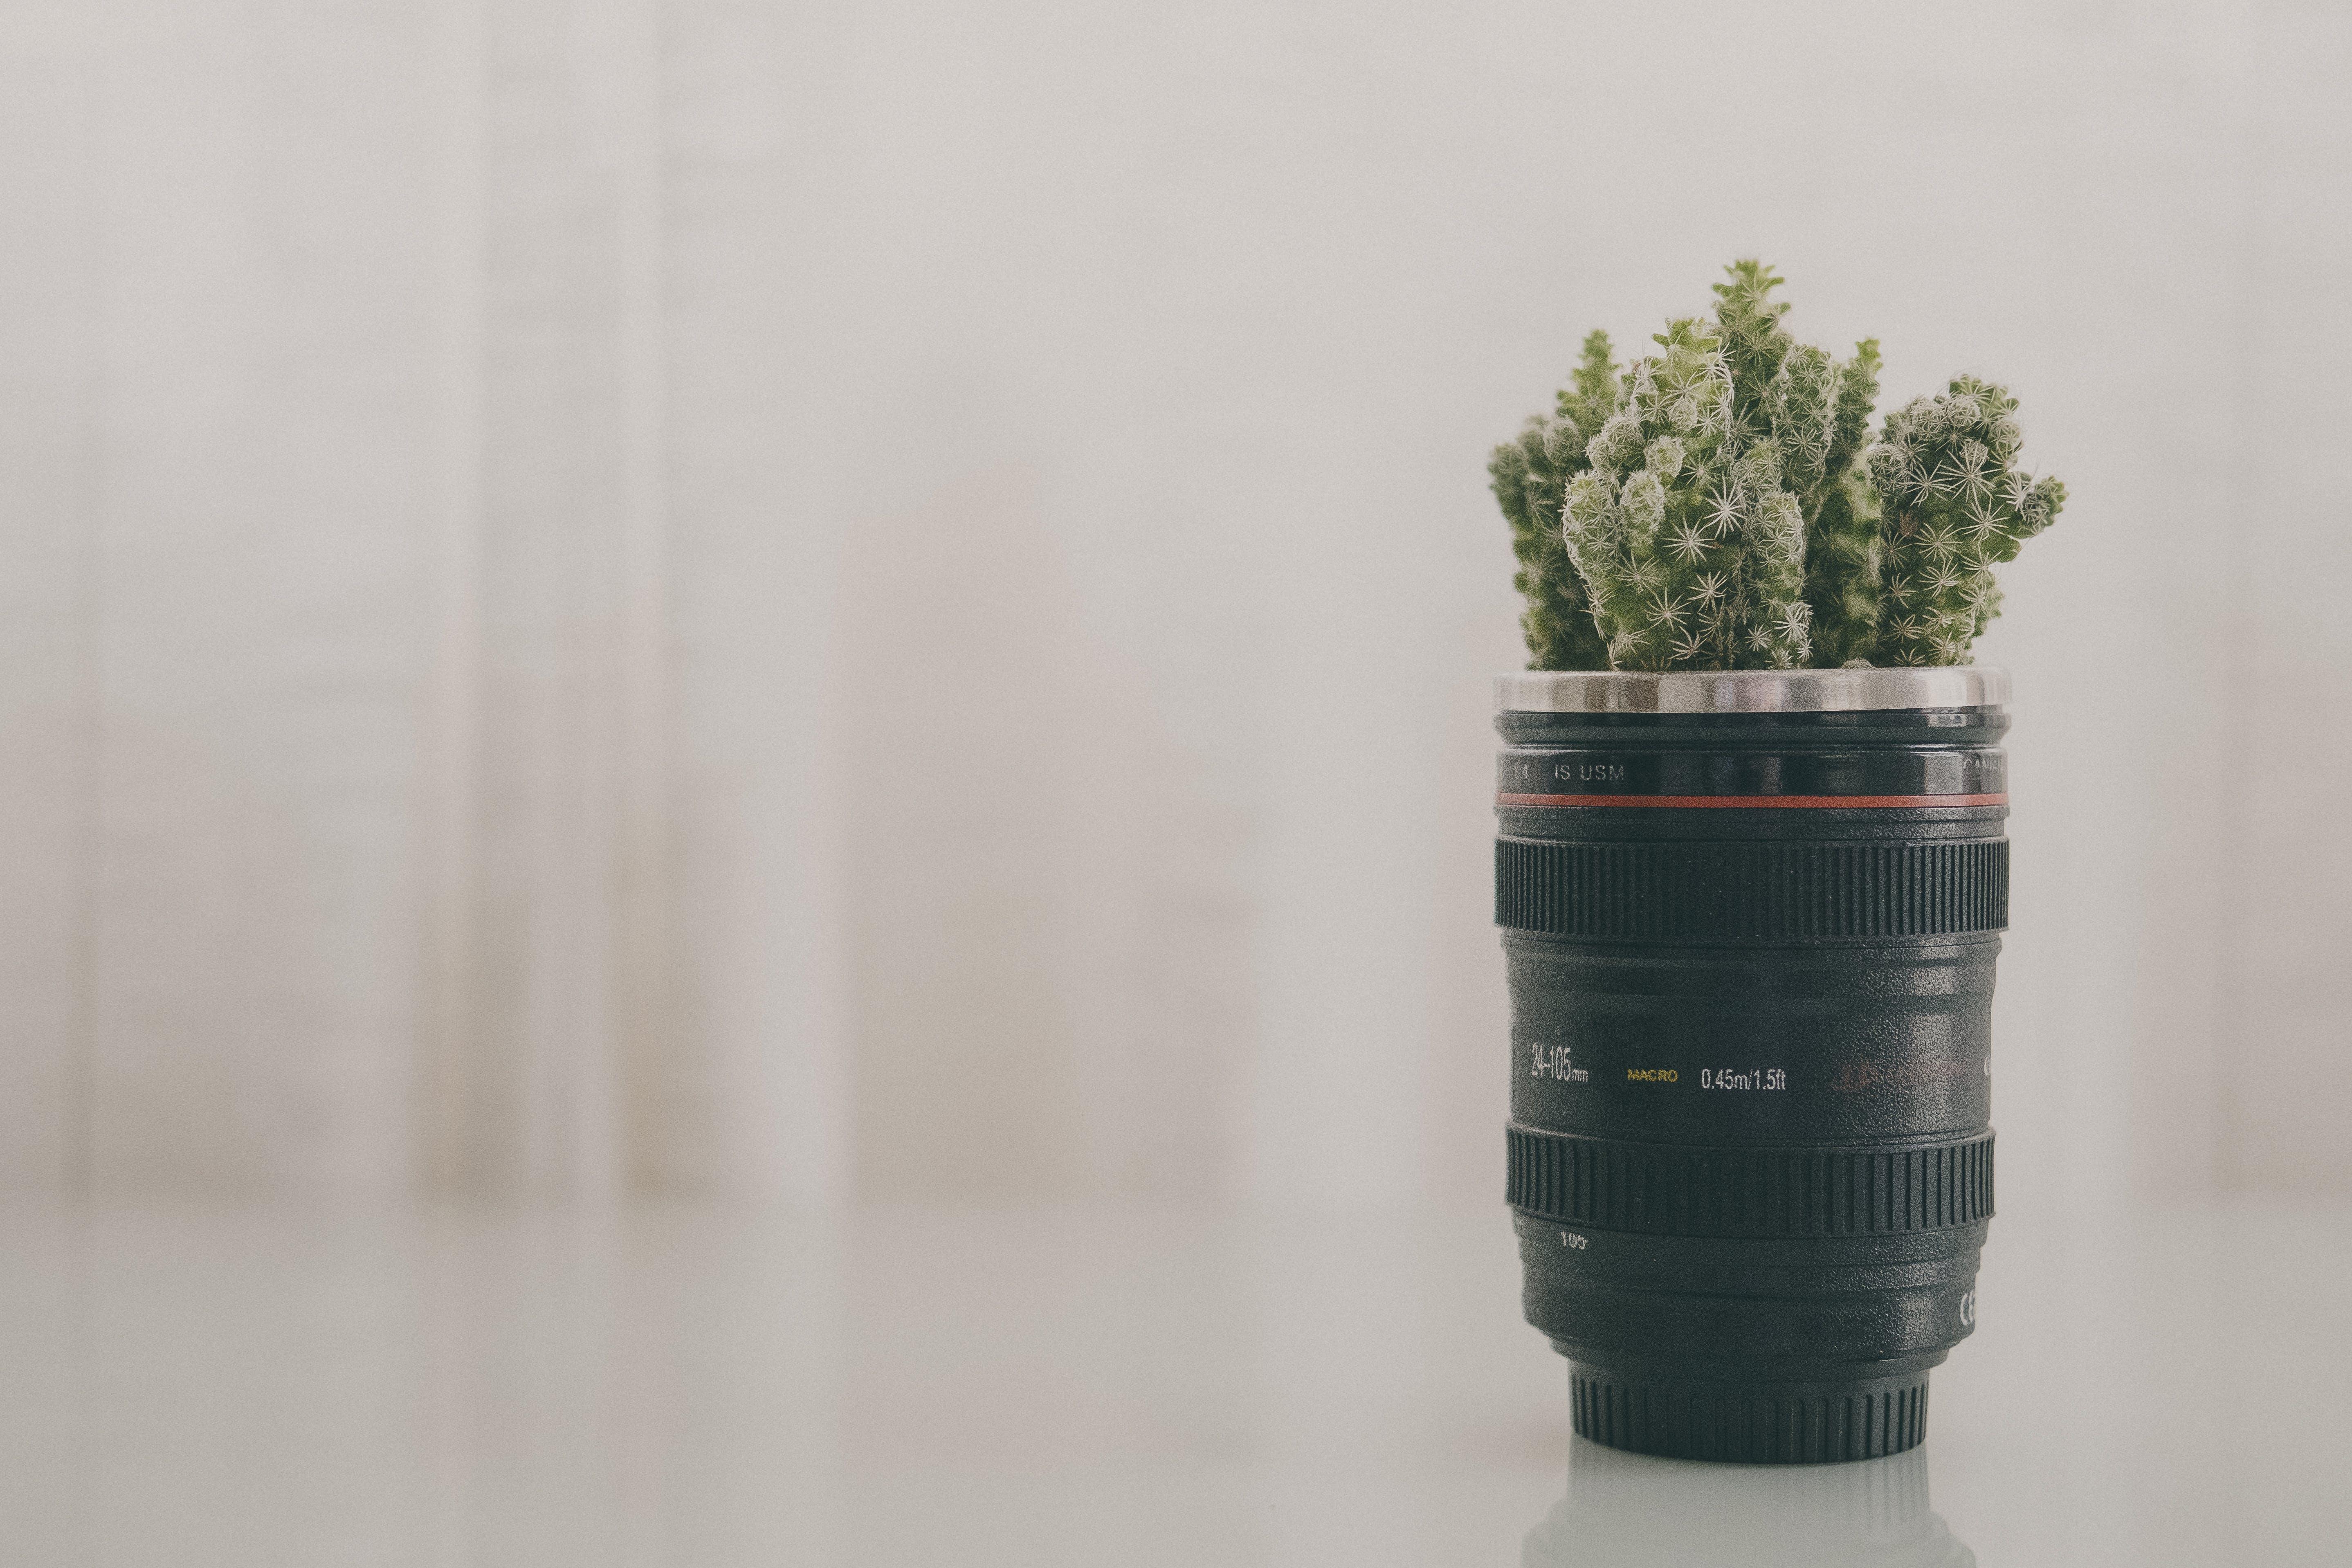 Green Leaf Plant in Black Camera Zoom Lens Plant Pot Screenshot